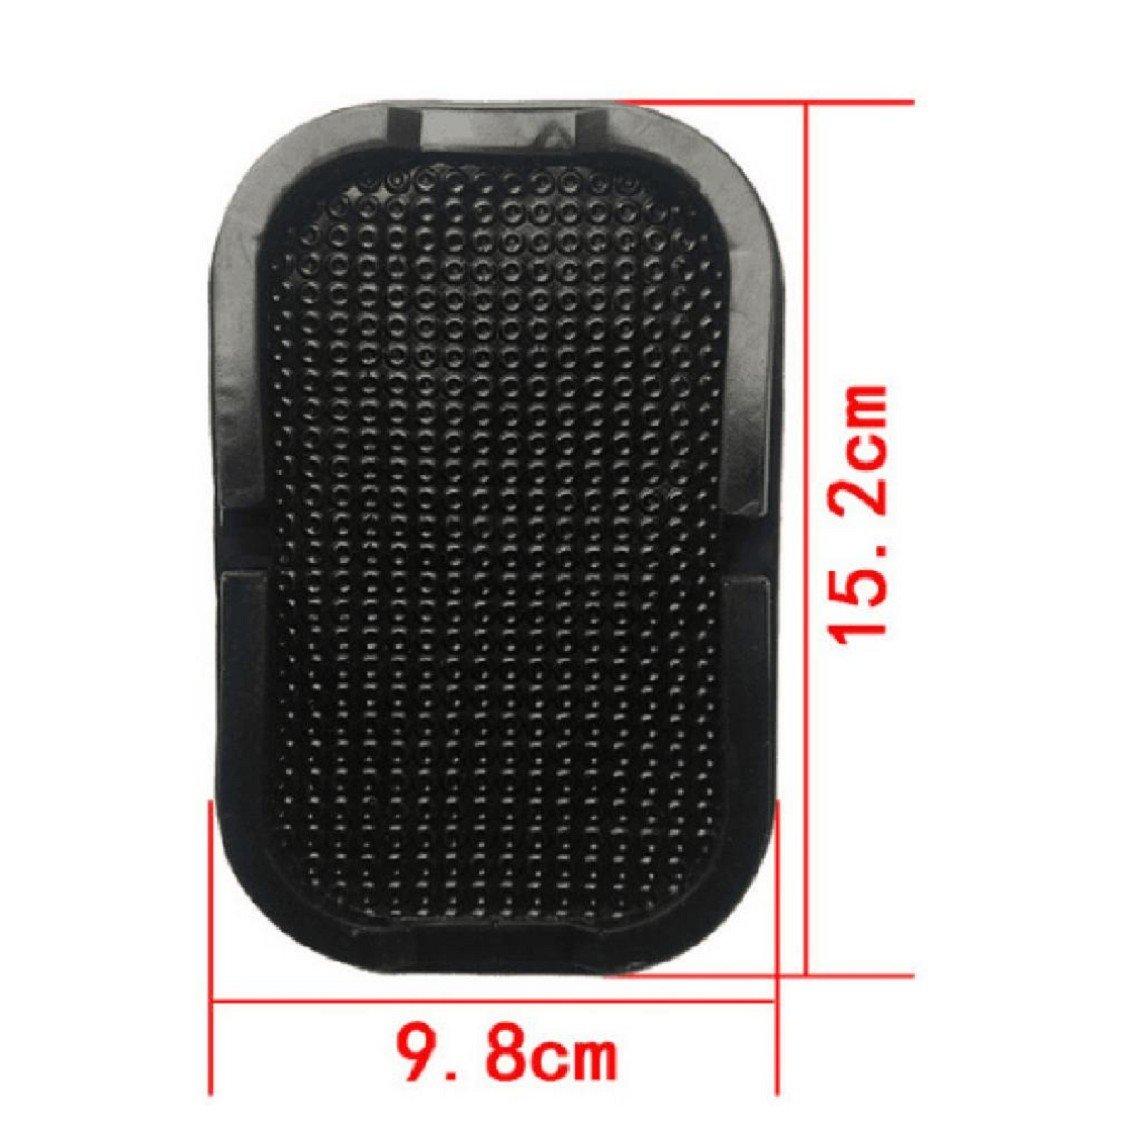 Naladoo Anti-Slip Car Sticky Pad Mat Mobile Phone Sticky accessories Mount Stick Holder by Naladoo (Image #5)